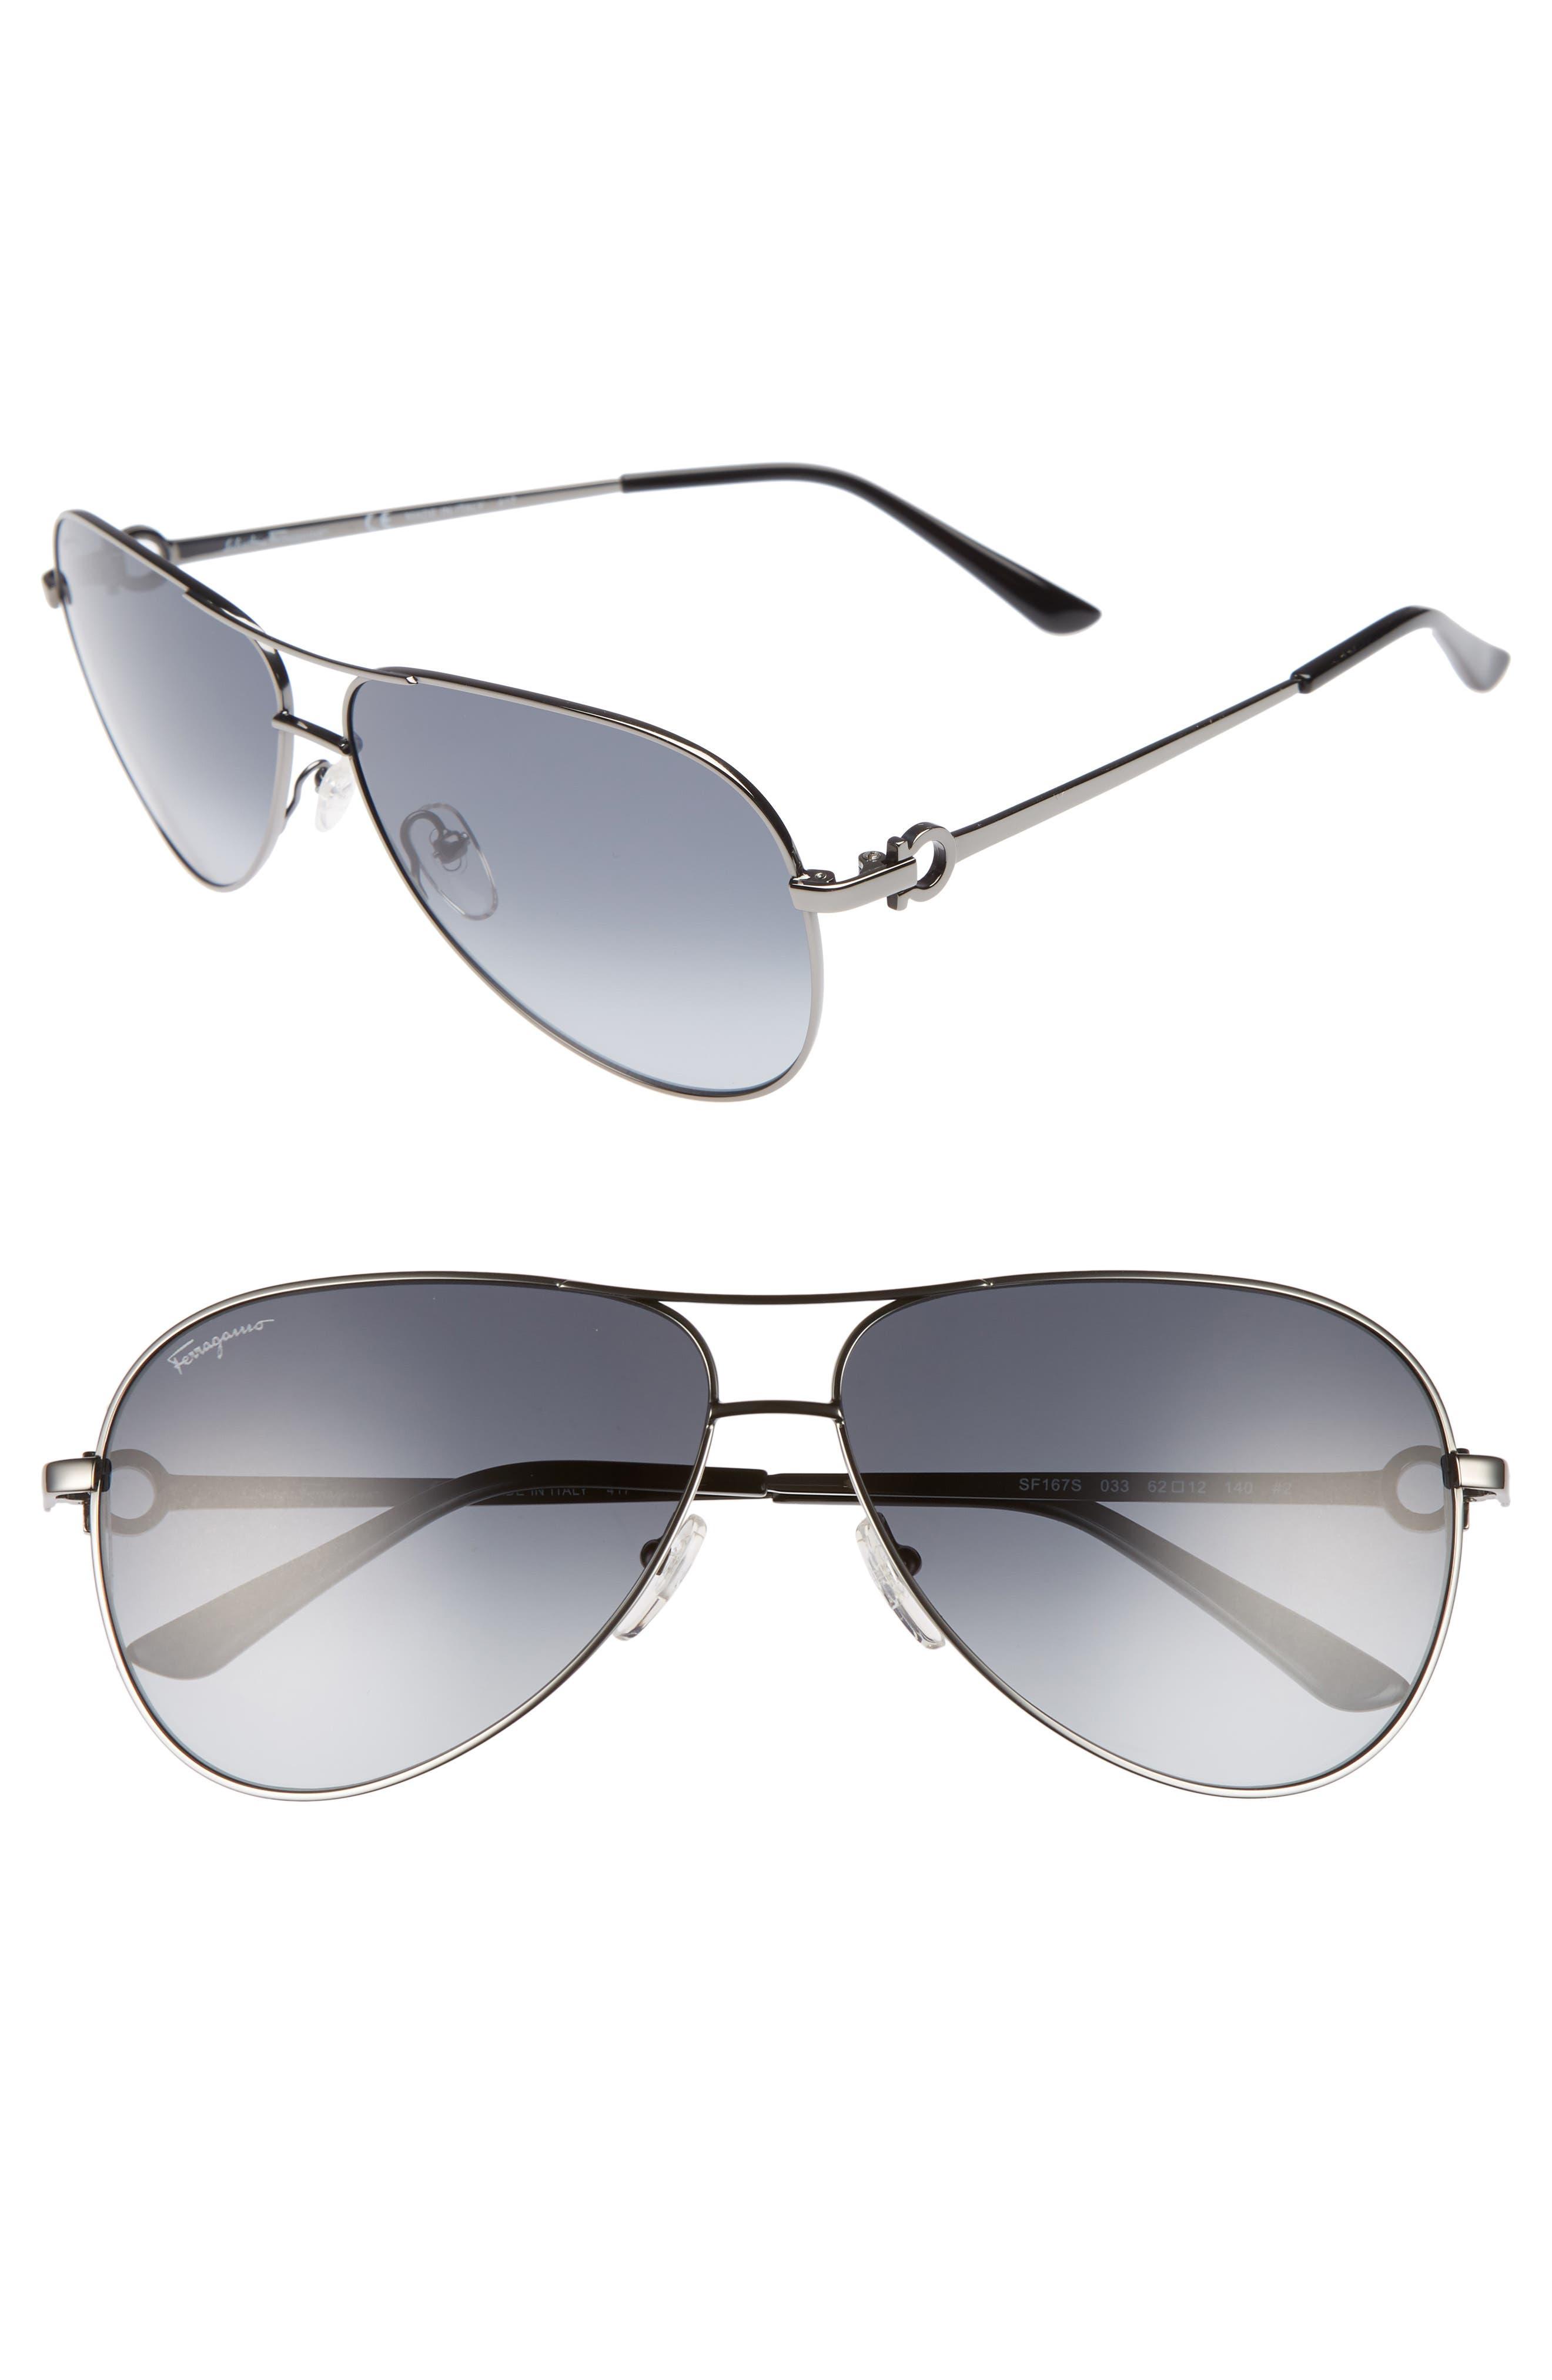 Gancio 62mm Aviator Sunglasses,                         Main,                         color, SHINY DARK GUNMETAL